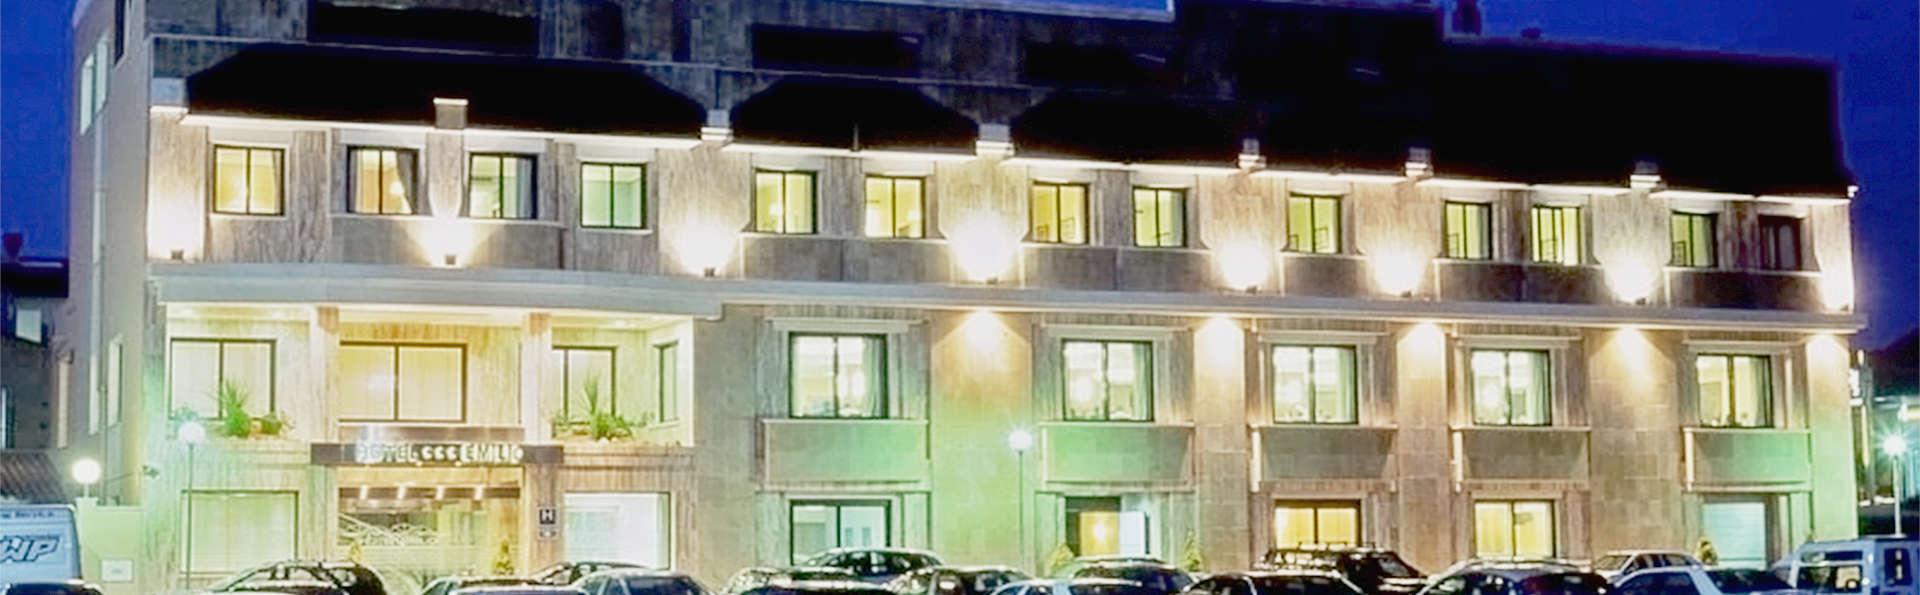 Hotel Restaurante Emilio - EDIT_24_NIT.jpg